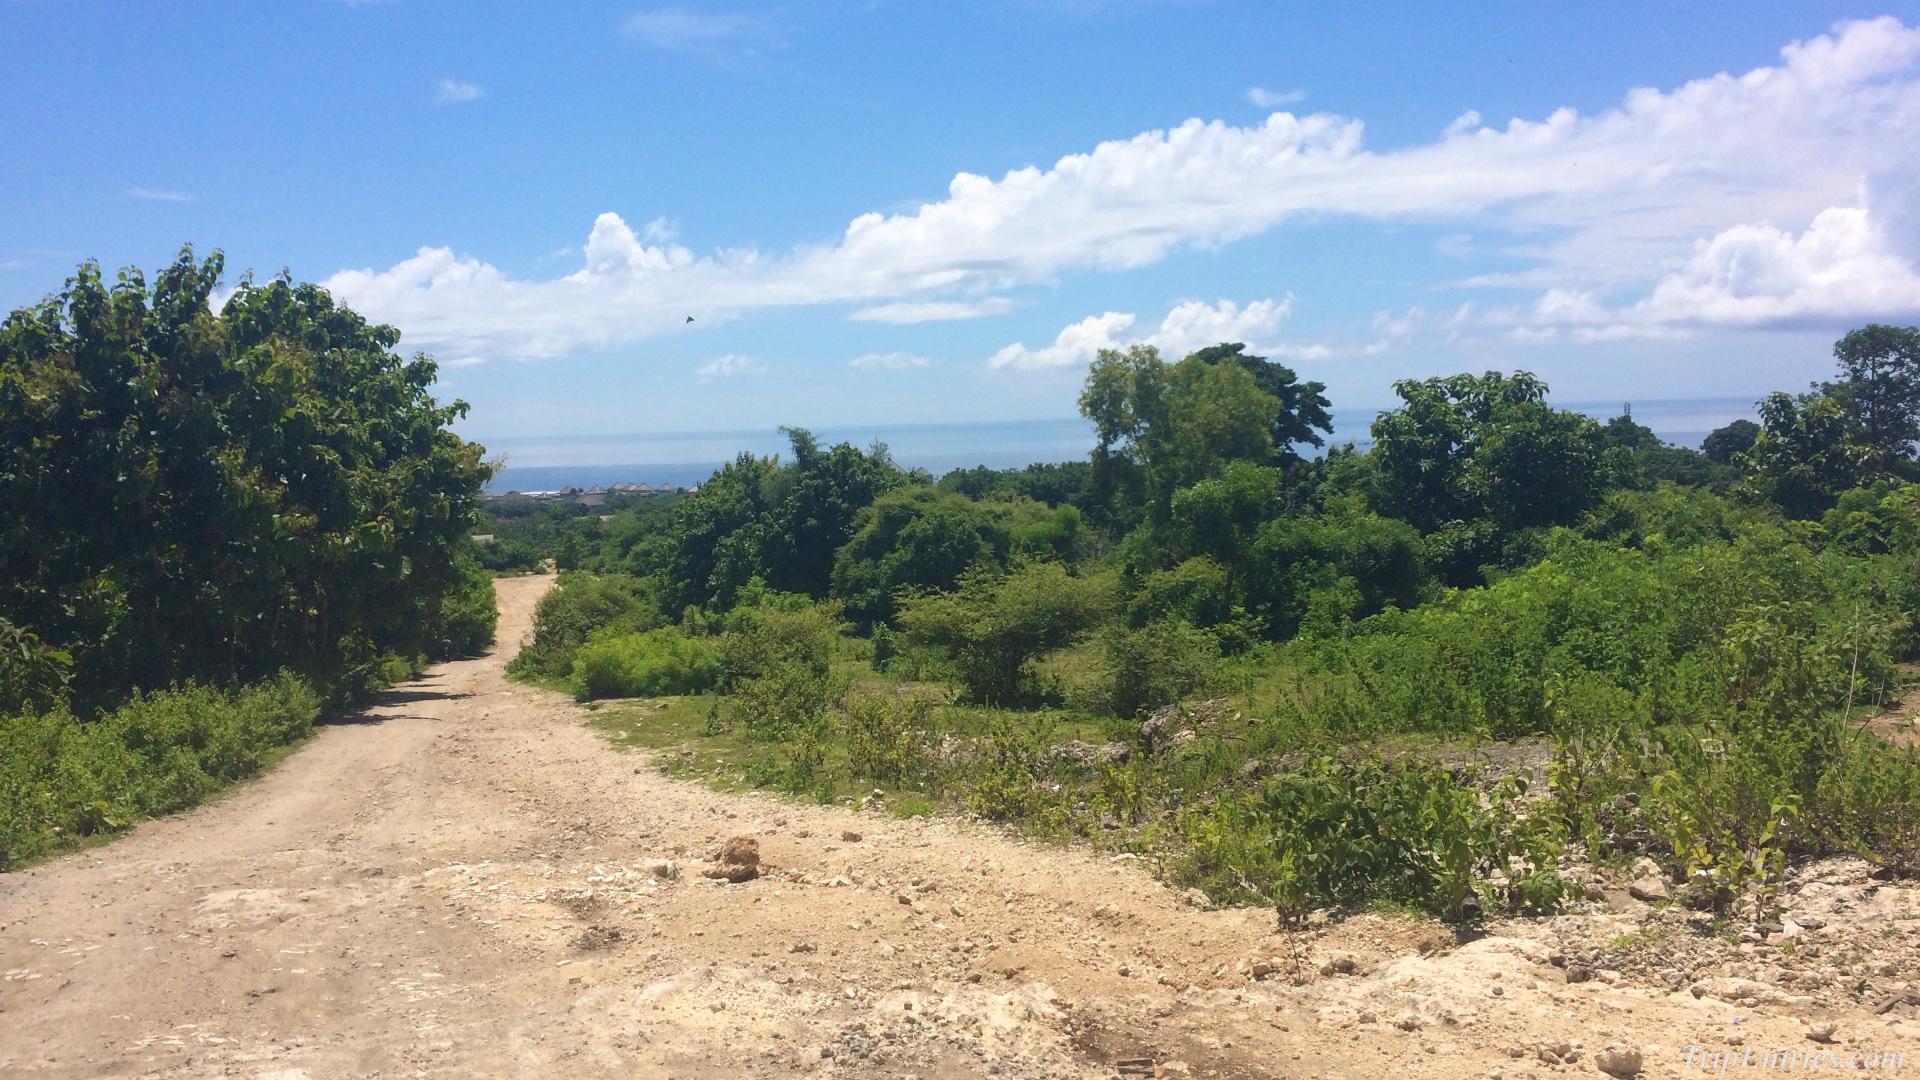 Поездка на Букит: Geger Beach, Pantai Pandawa beach